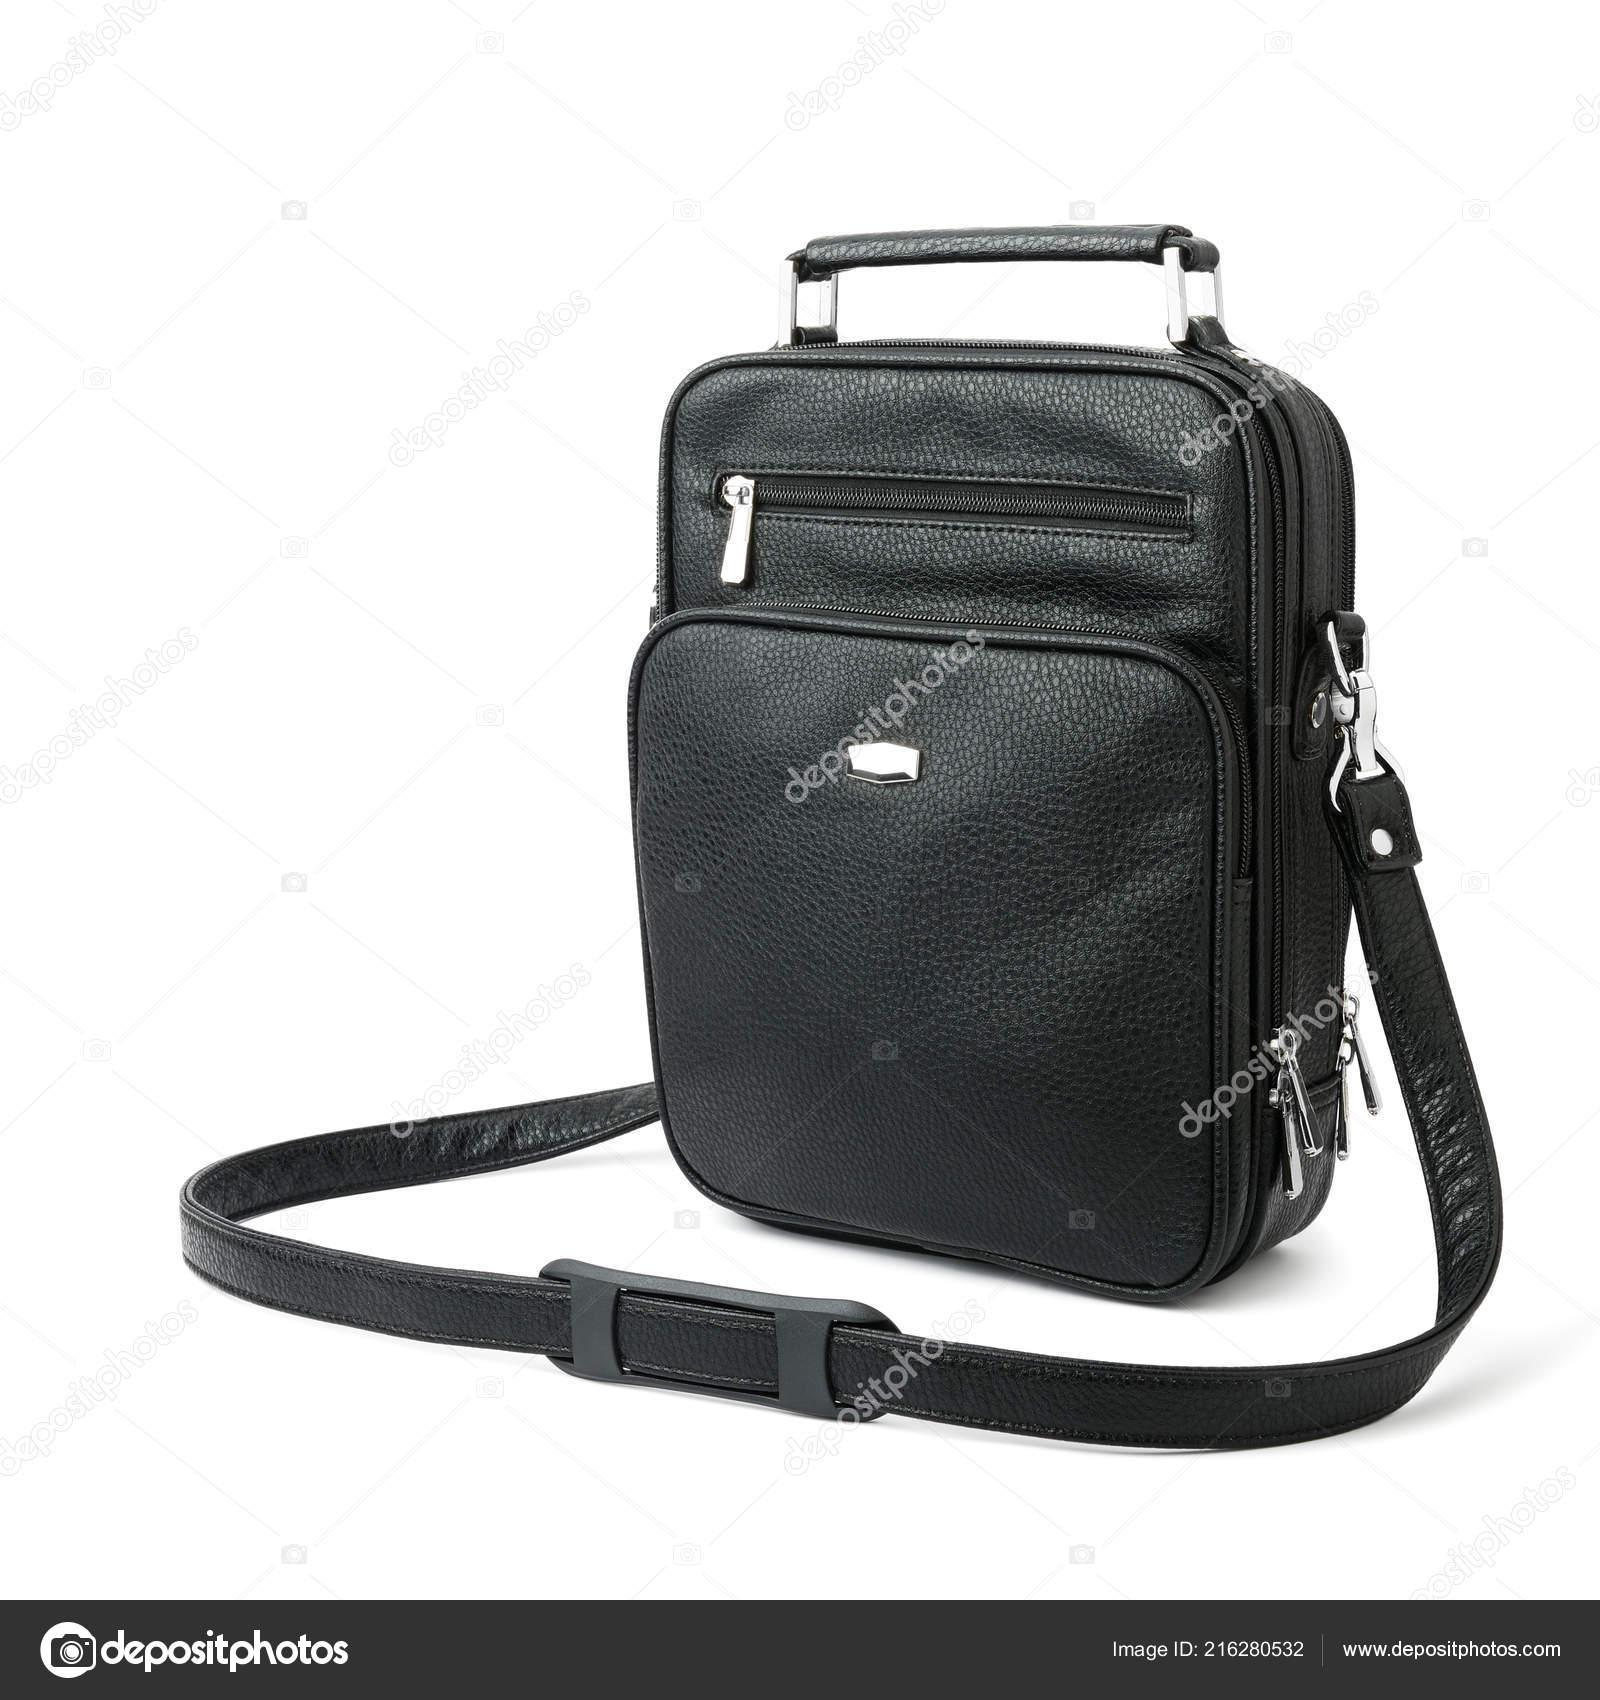 4d1a974a31 Μαύρη Ανδρική Τσάντα Για Αξεσουάρ Έγγραφα Και Χρήματα Που Απομονώνονται —  Φωτογραφία Αρχείου